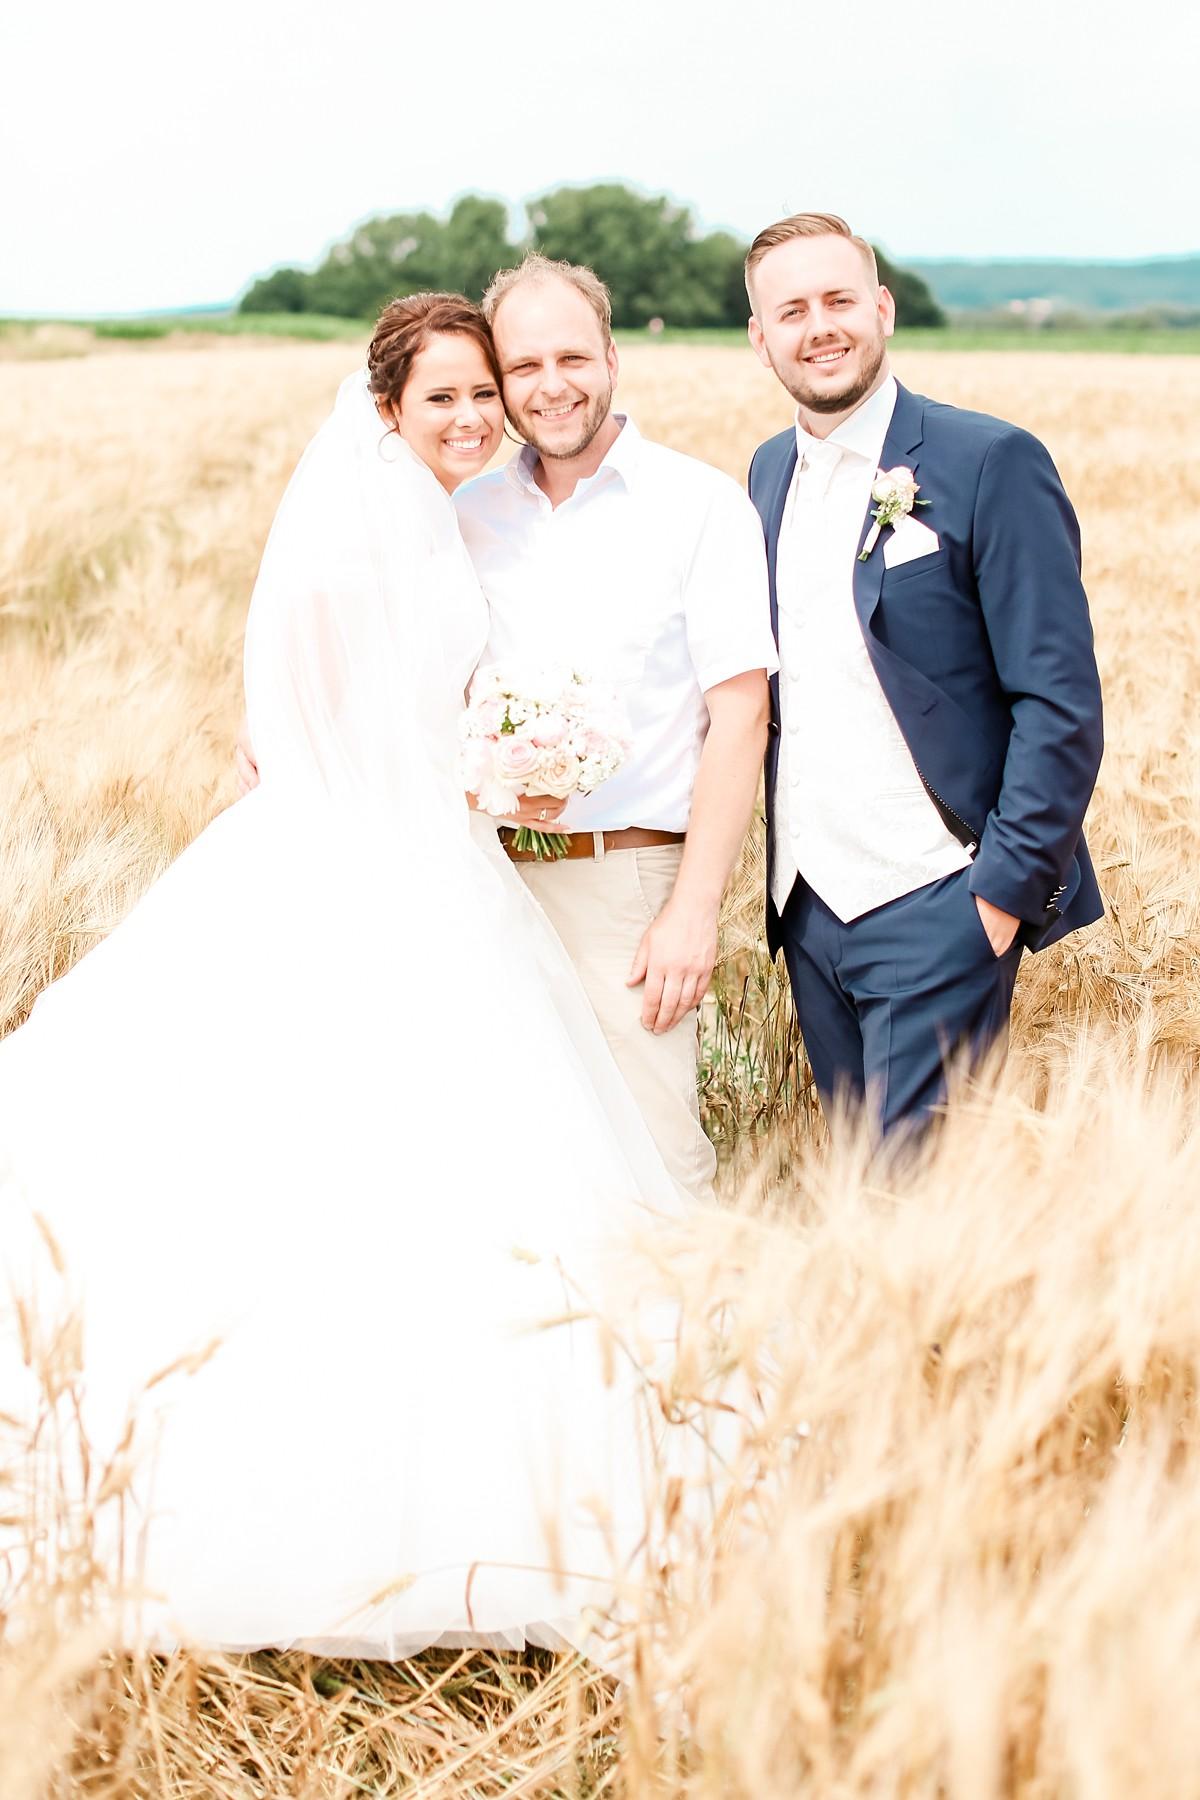 Hochzeitsfotograf-Bünde-Hücker-Moor-Fotograf-Moor-Ranch_0171